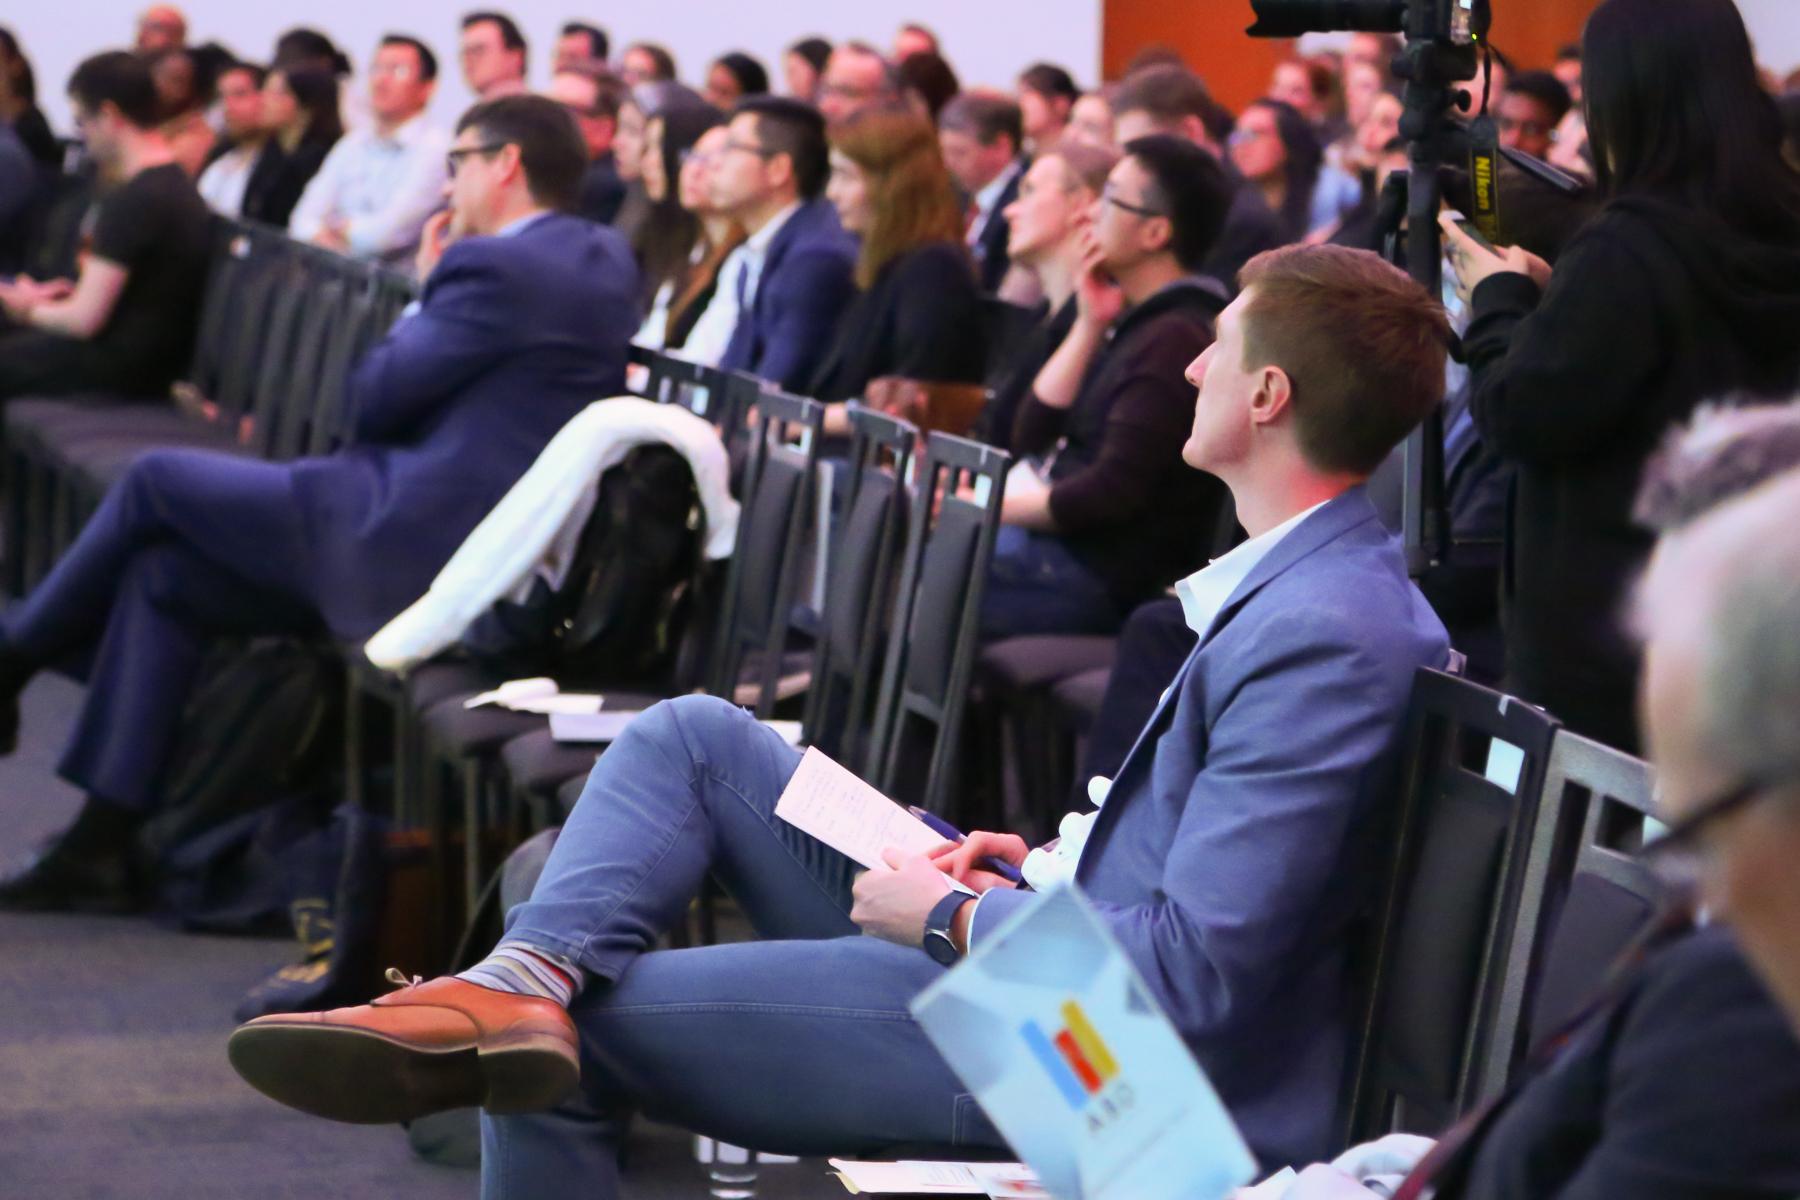 ABD_Conference_2018-057.jpg